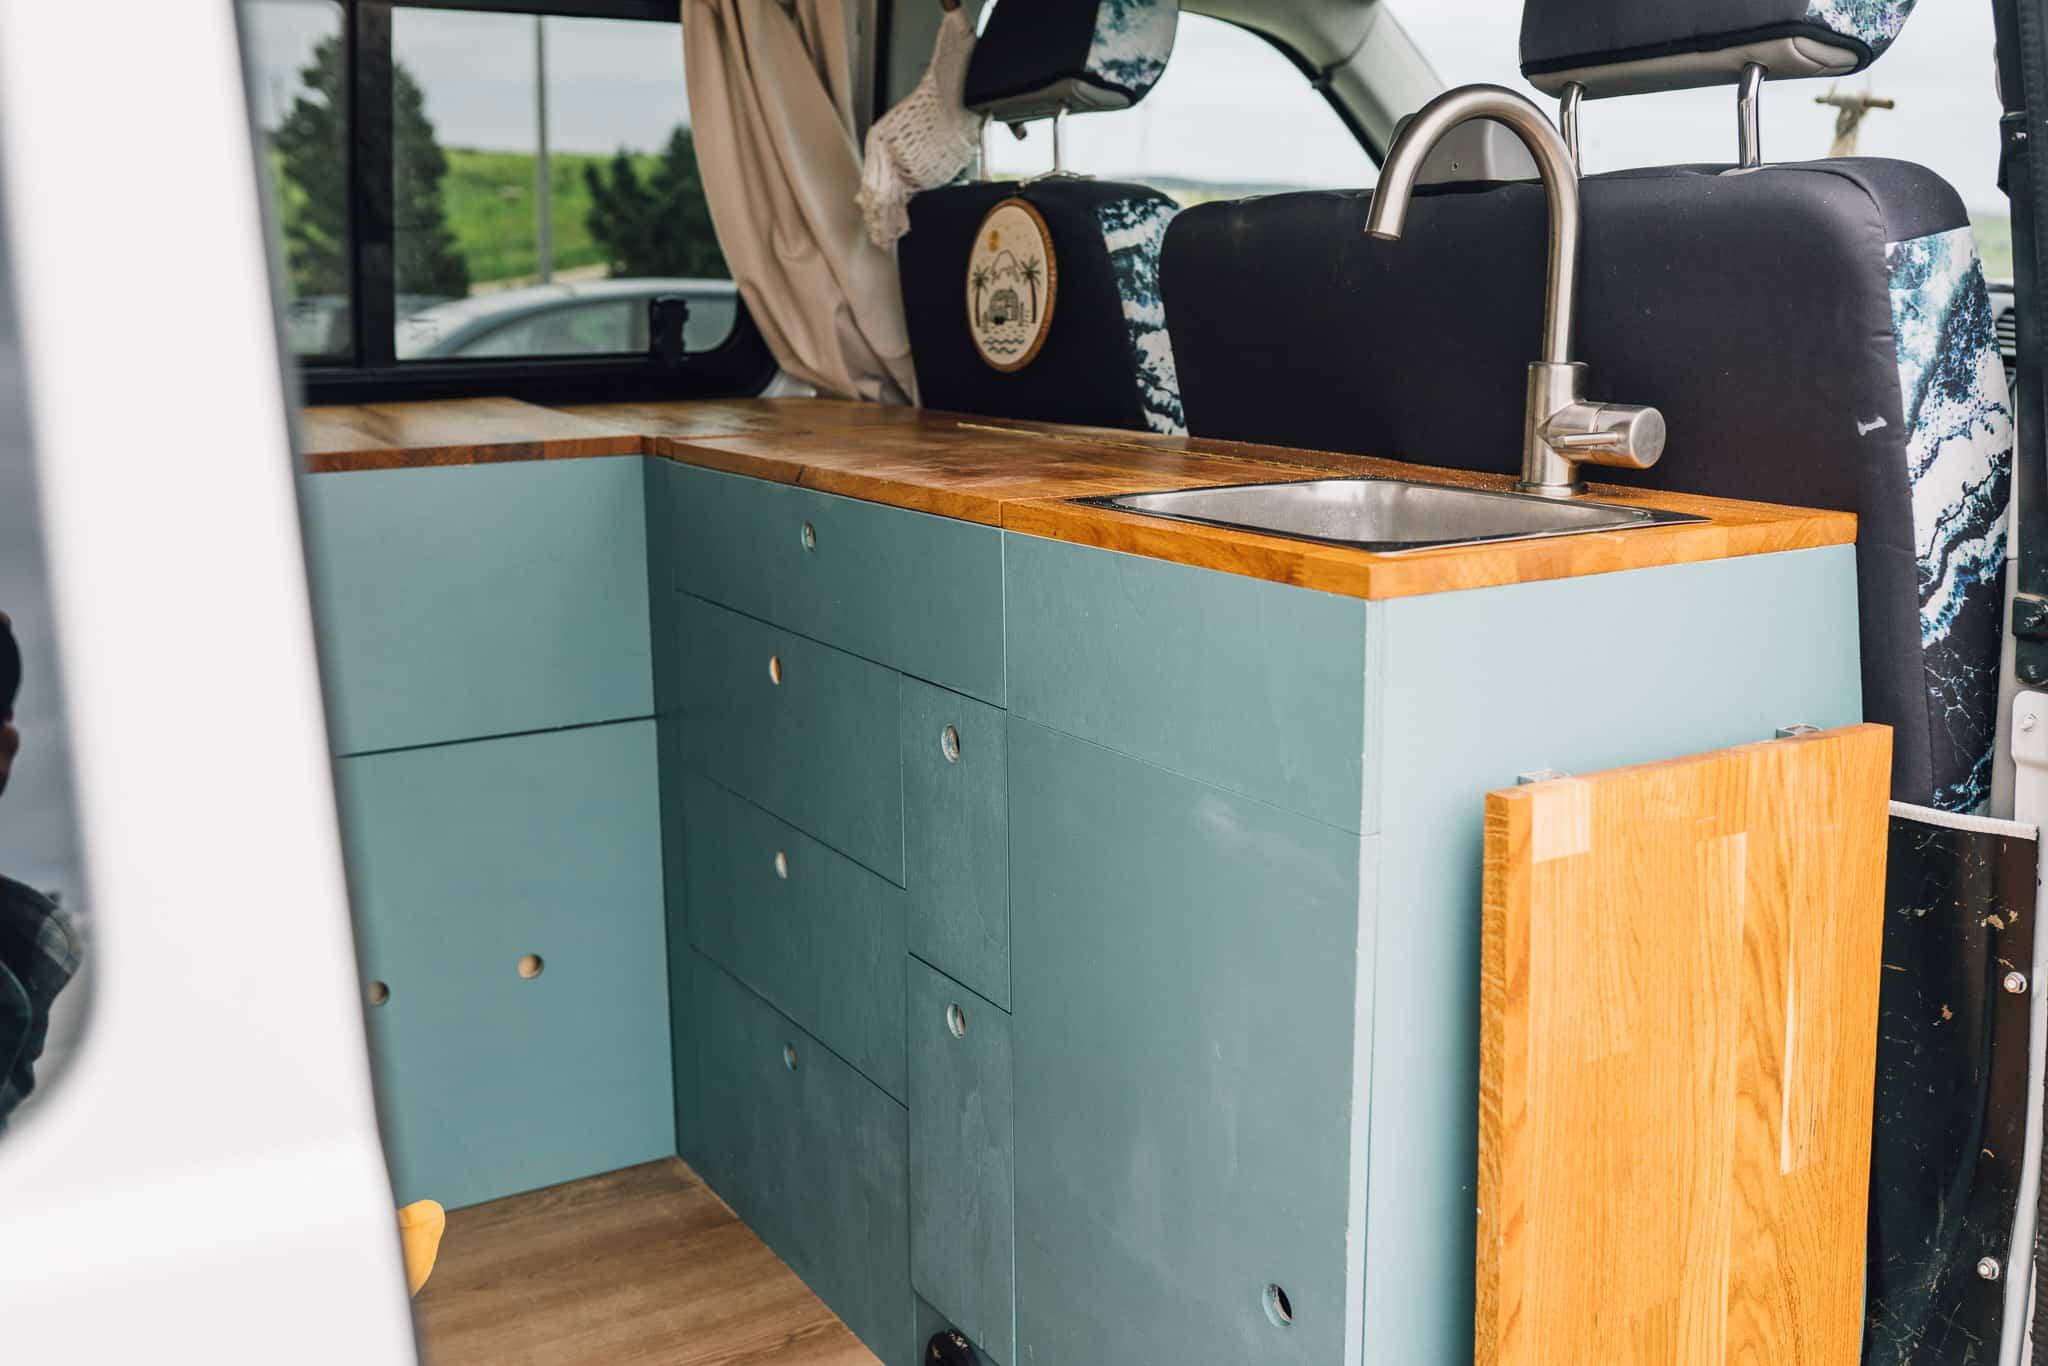 VW T5 Camper Küche Holz Spüle Vorhang Stickerei